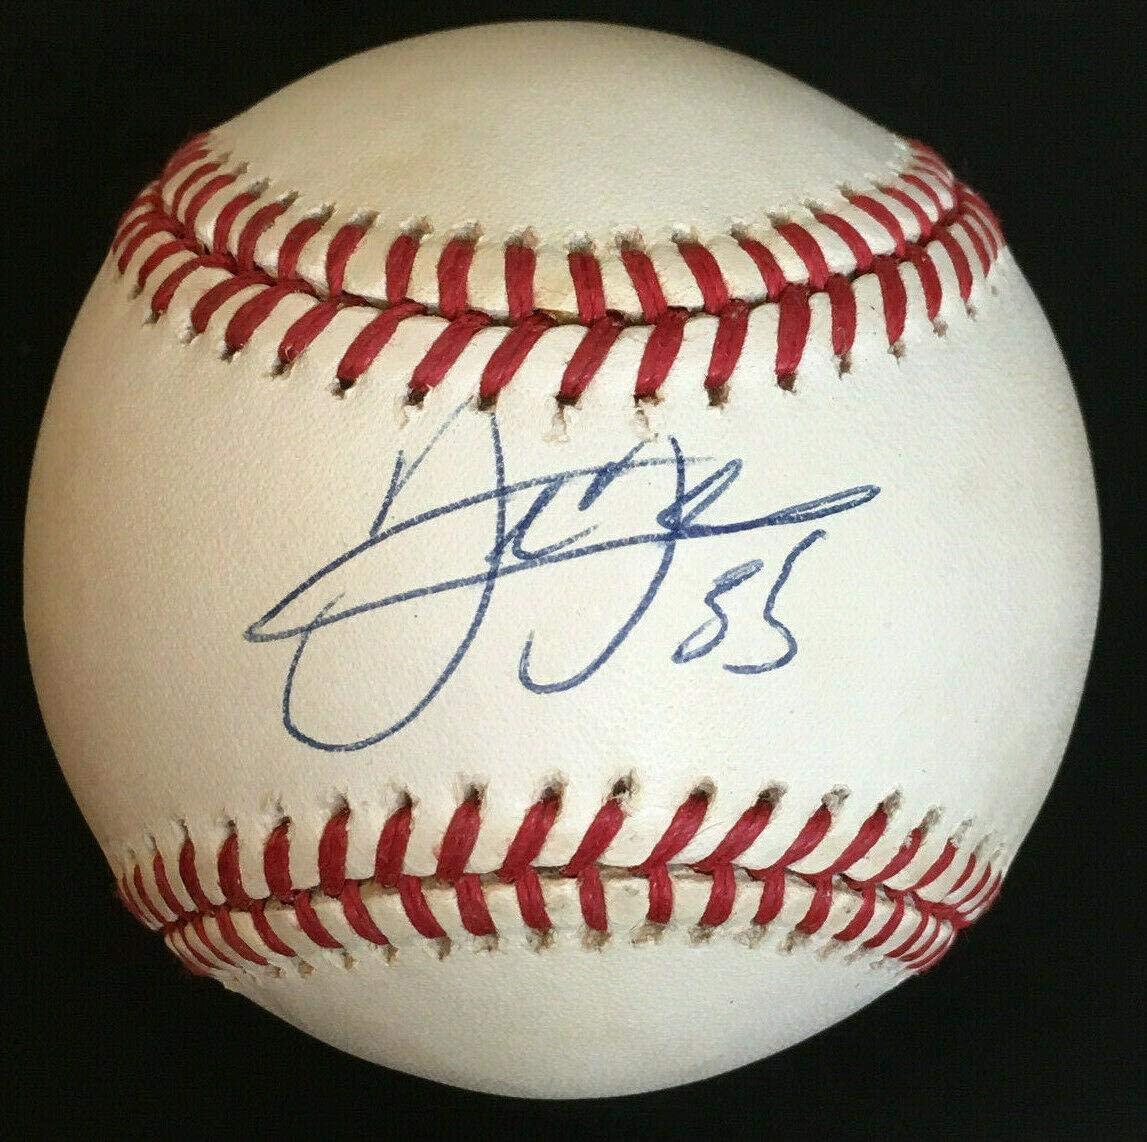 Signed Frank Thomas Ball - Official AL HOF COA - PSA/DNA Certified - Autographed Baseballs